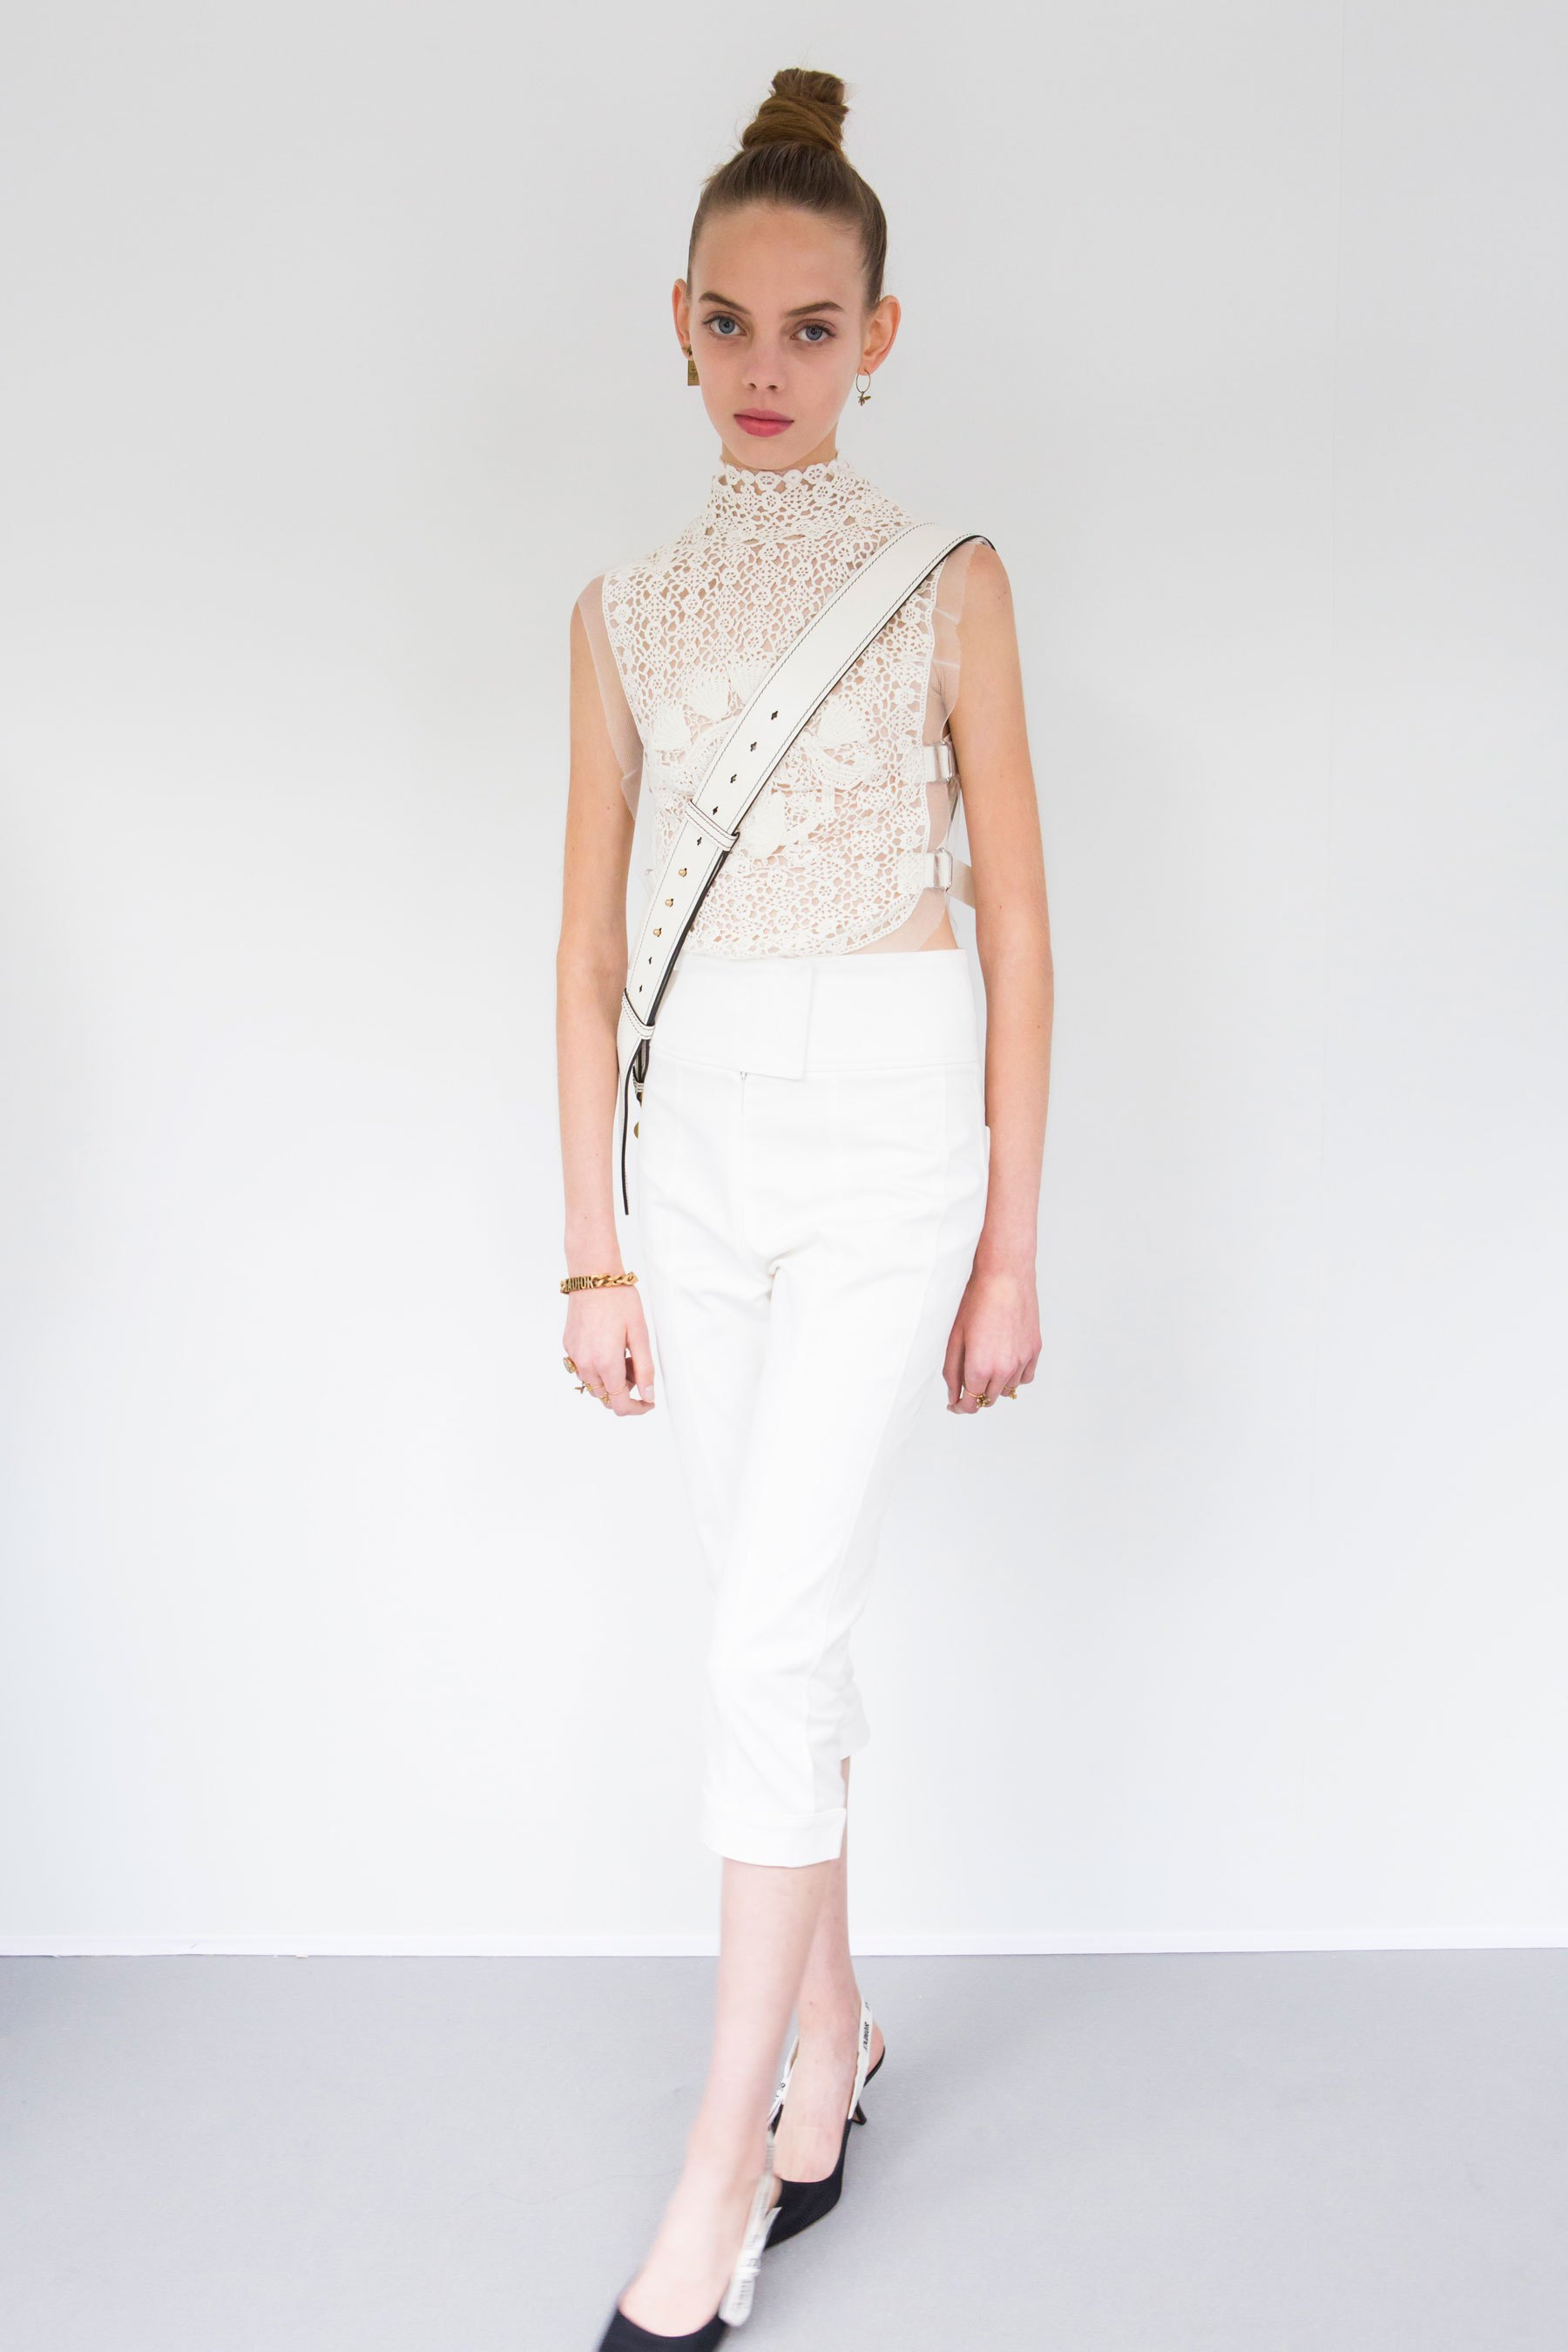 Mariana Zaragoza walking for Christian Dior Spring 2017